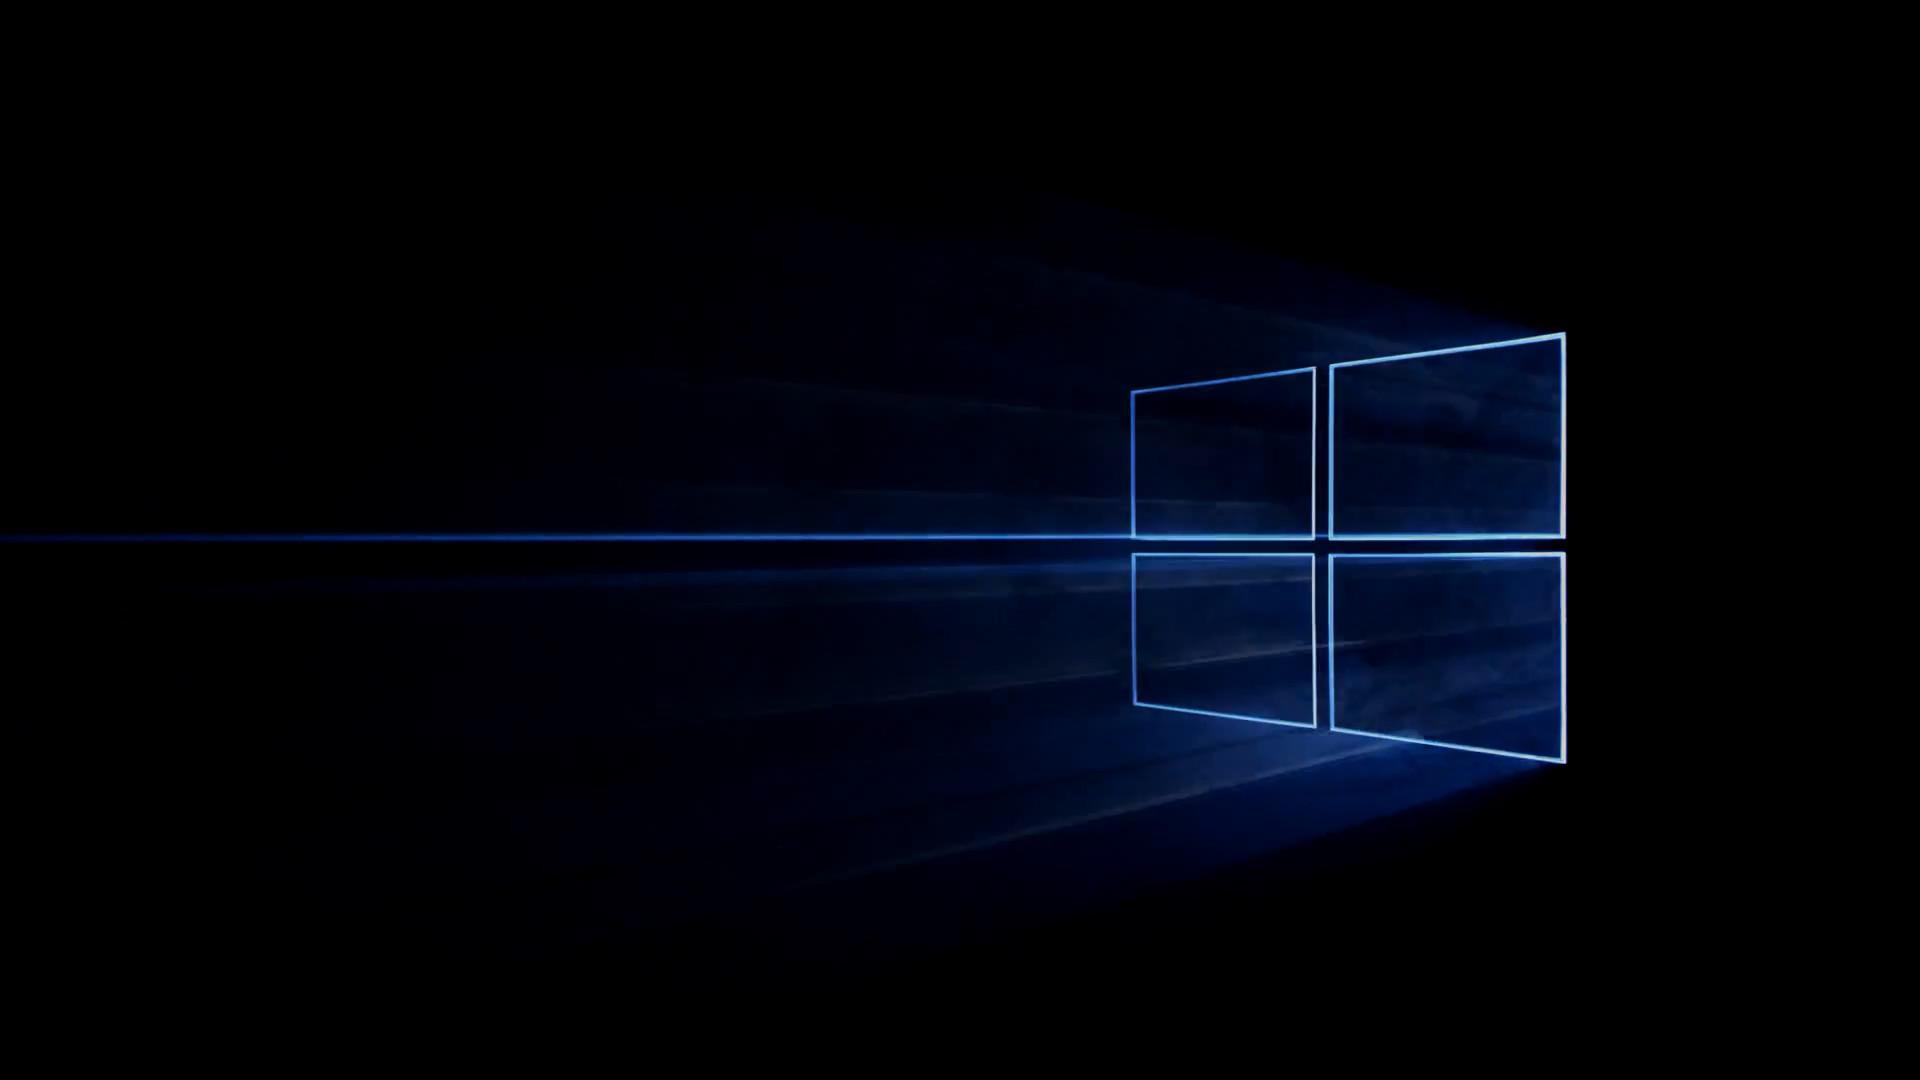 Res: 1920x1080, Windows 10 Hero Wallpaper {Static} by WandersonS13